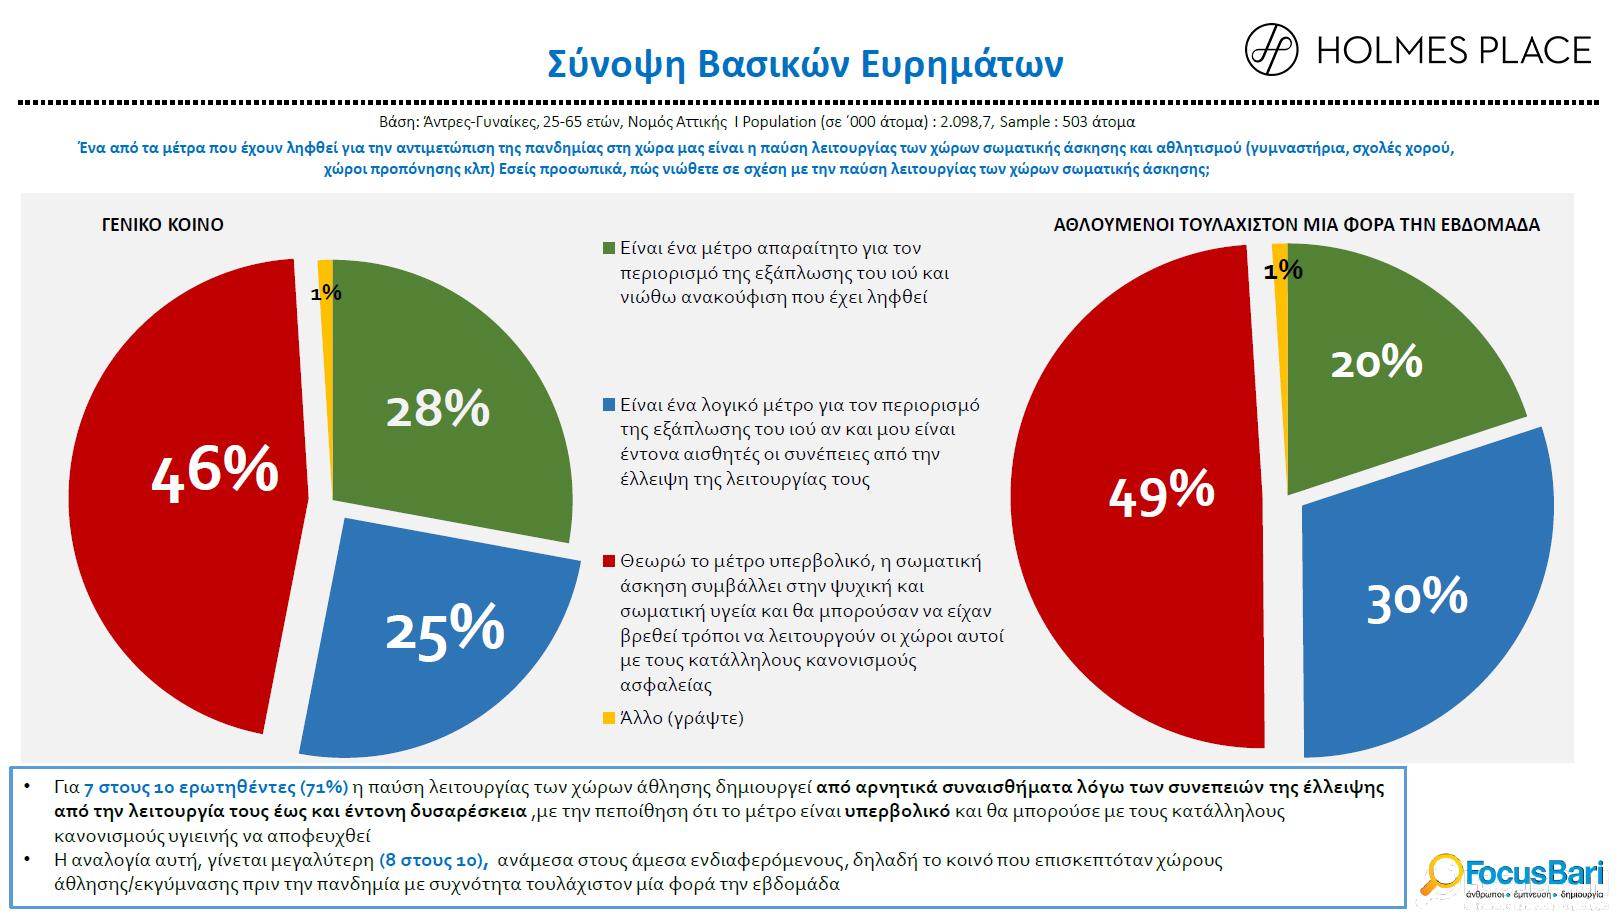 7-%cf%83%cf%84%ce%bf%cf%85%cf%82-10-%ce%ad%ce%bb%ce%bb%ce%b7%ce%bd%ce%b5%cf%82-%ce%b5%cf%80%ce%b9%ce%b8%cf%85%ce%bc%ce%bf%cf%8d%ce%bd-%cf%84%ce%b7%ce%bd-%ce%b5%cf%80%ce%b1%ce%bd%ce%b1%ce%bb%ce%b51